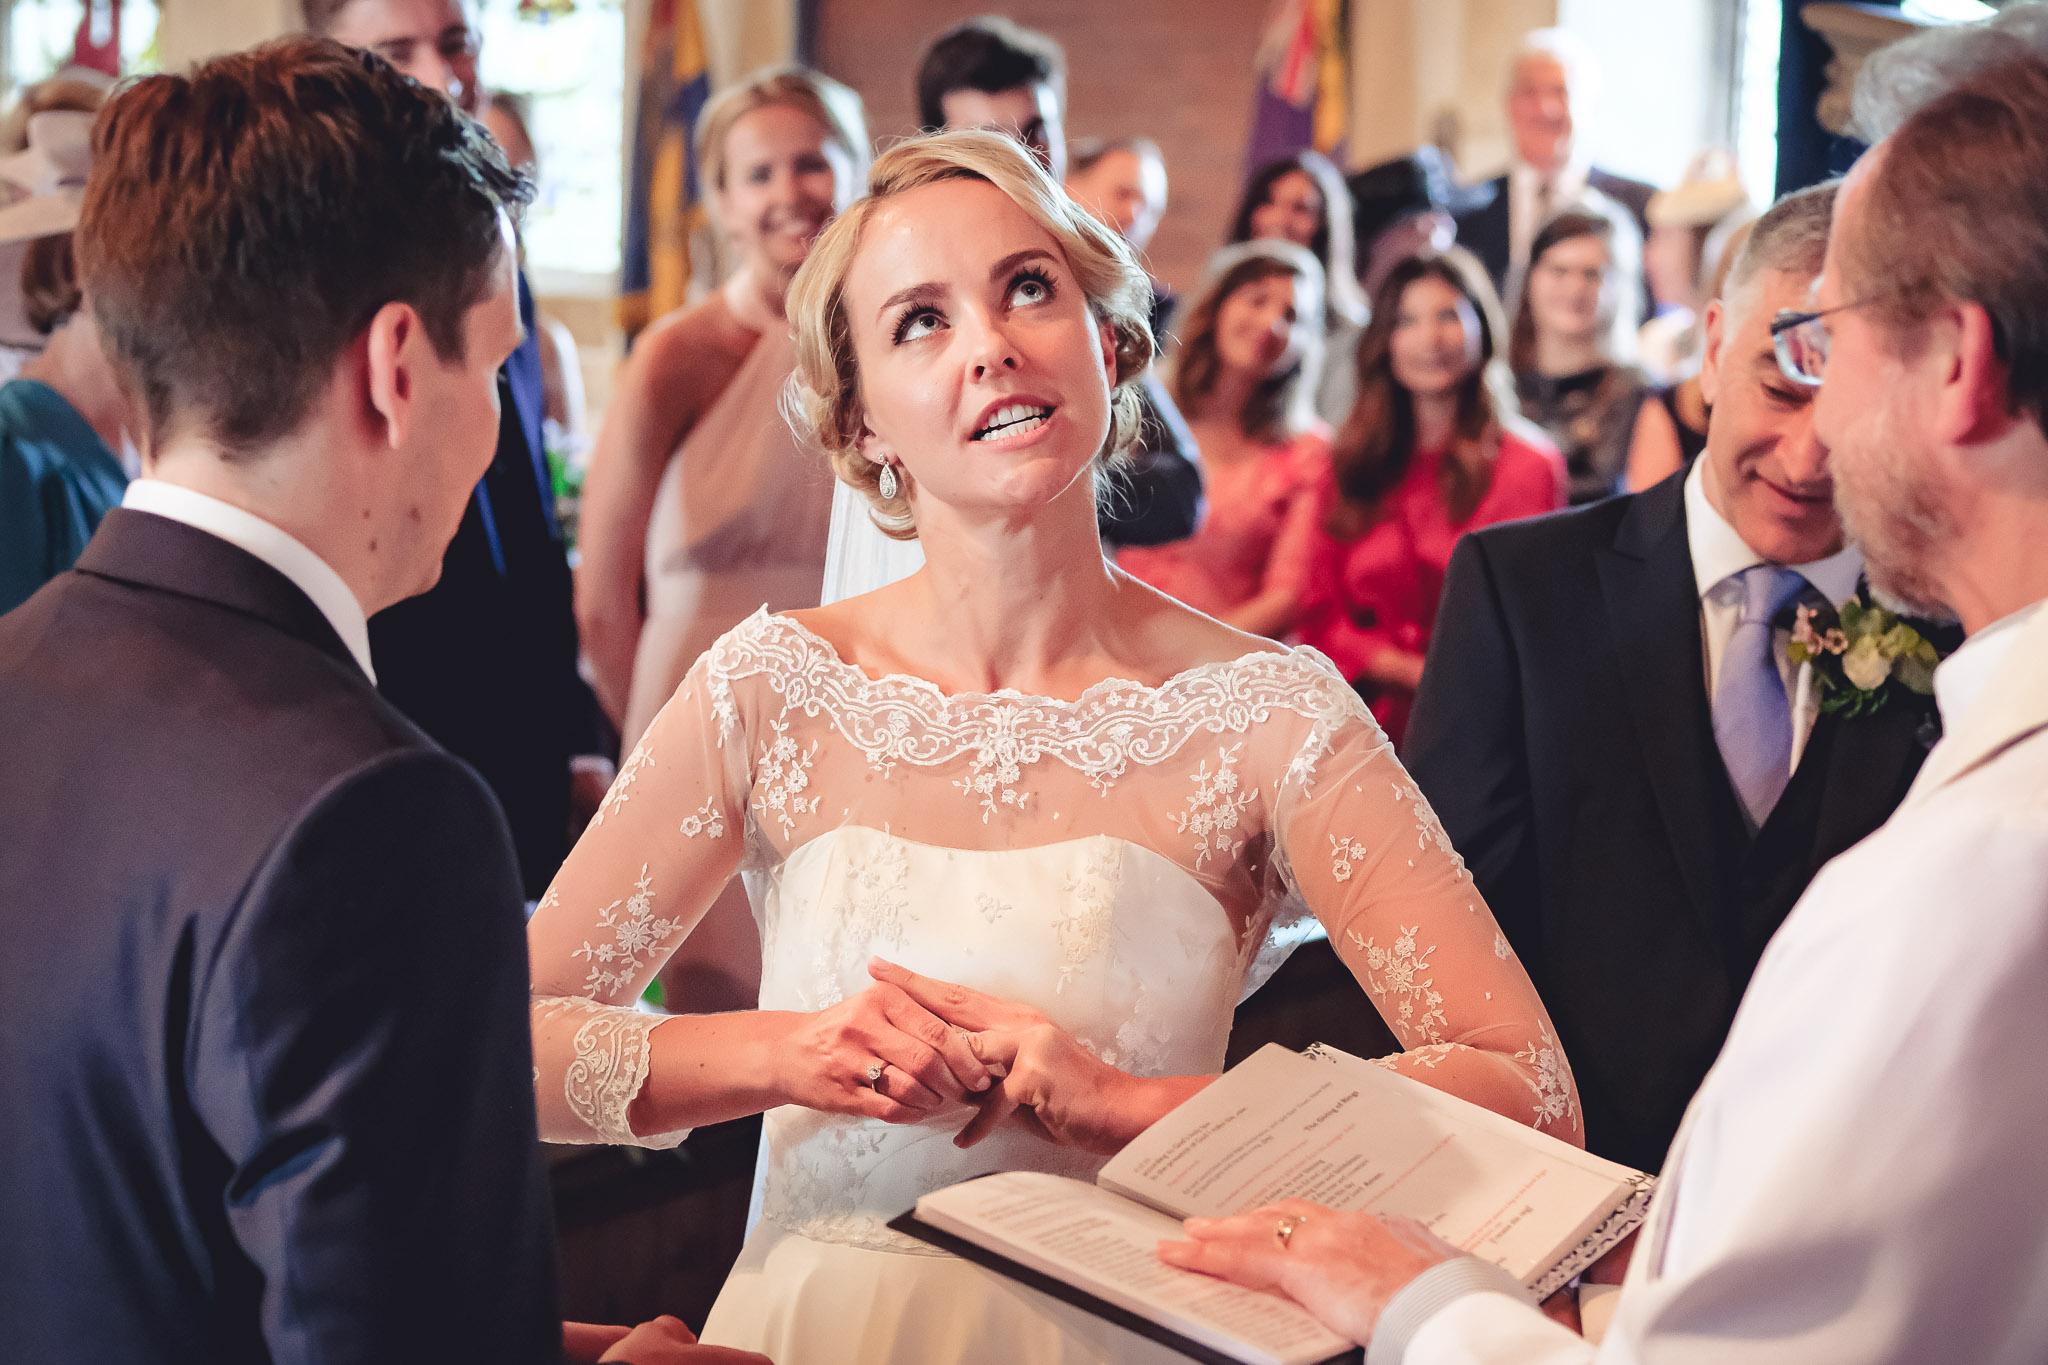 bride-moment-at-ceremony-andrew-billington-photography